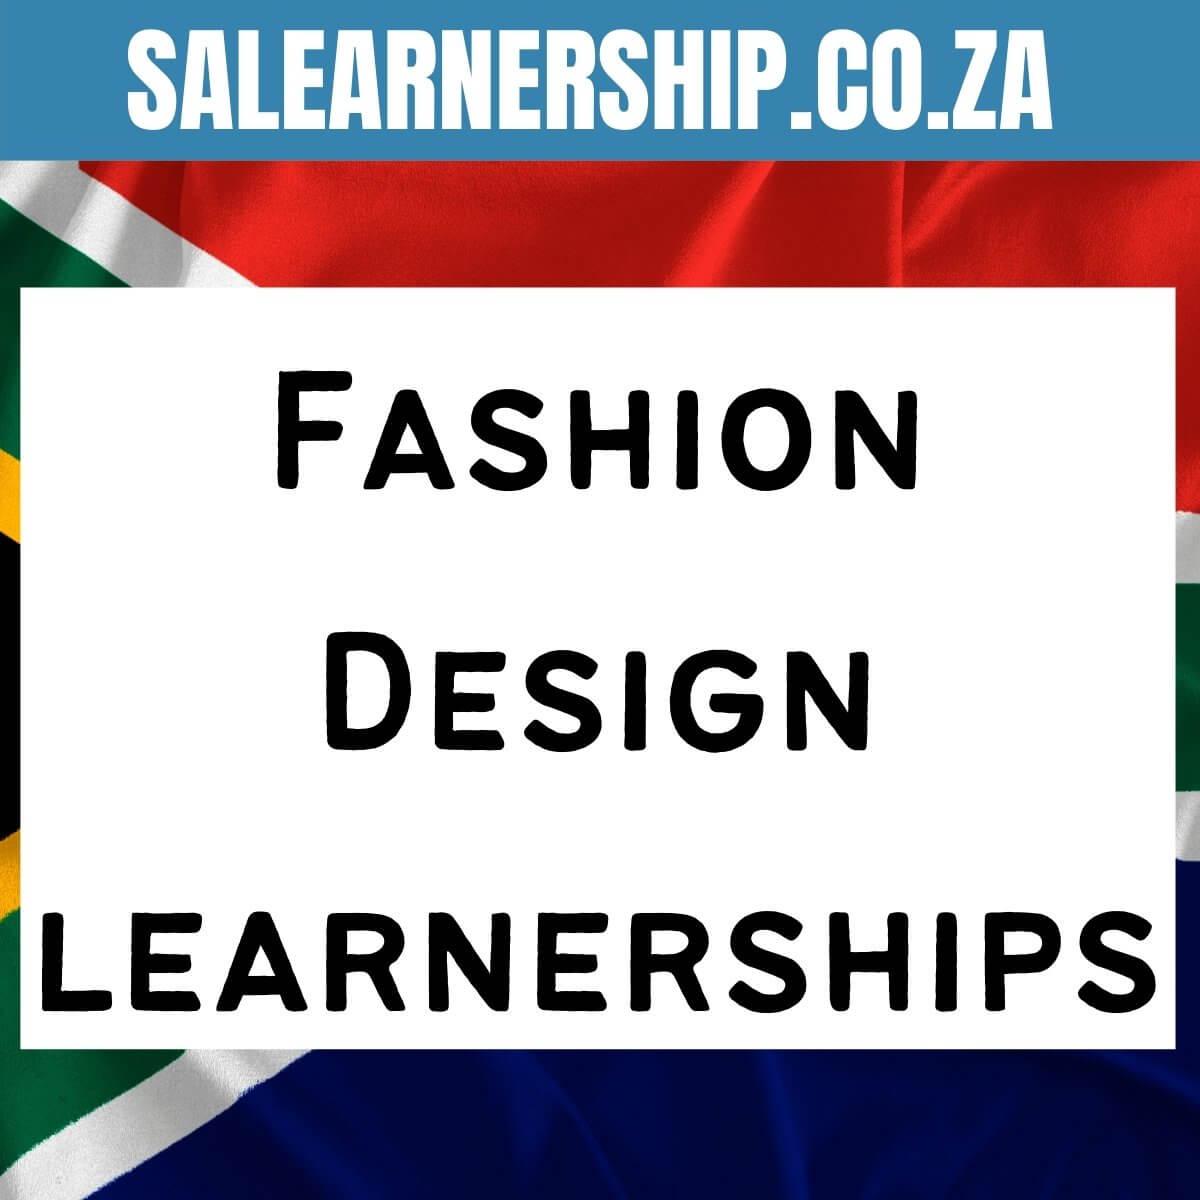 Fashion Design learnerships